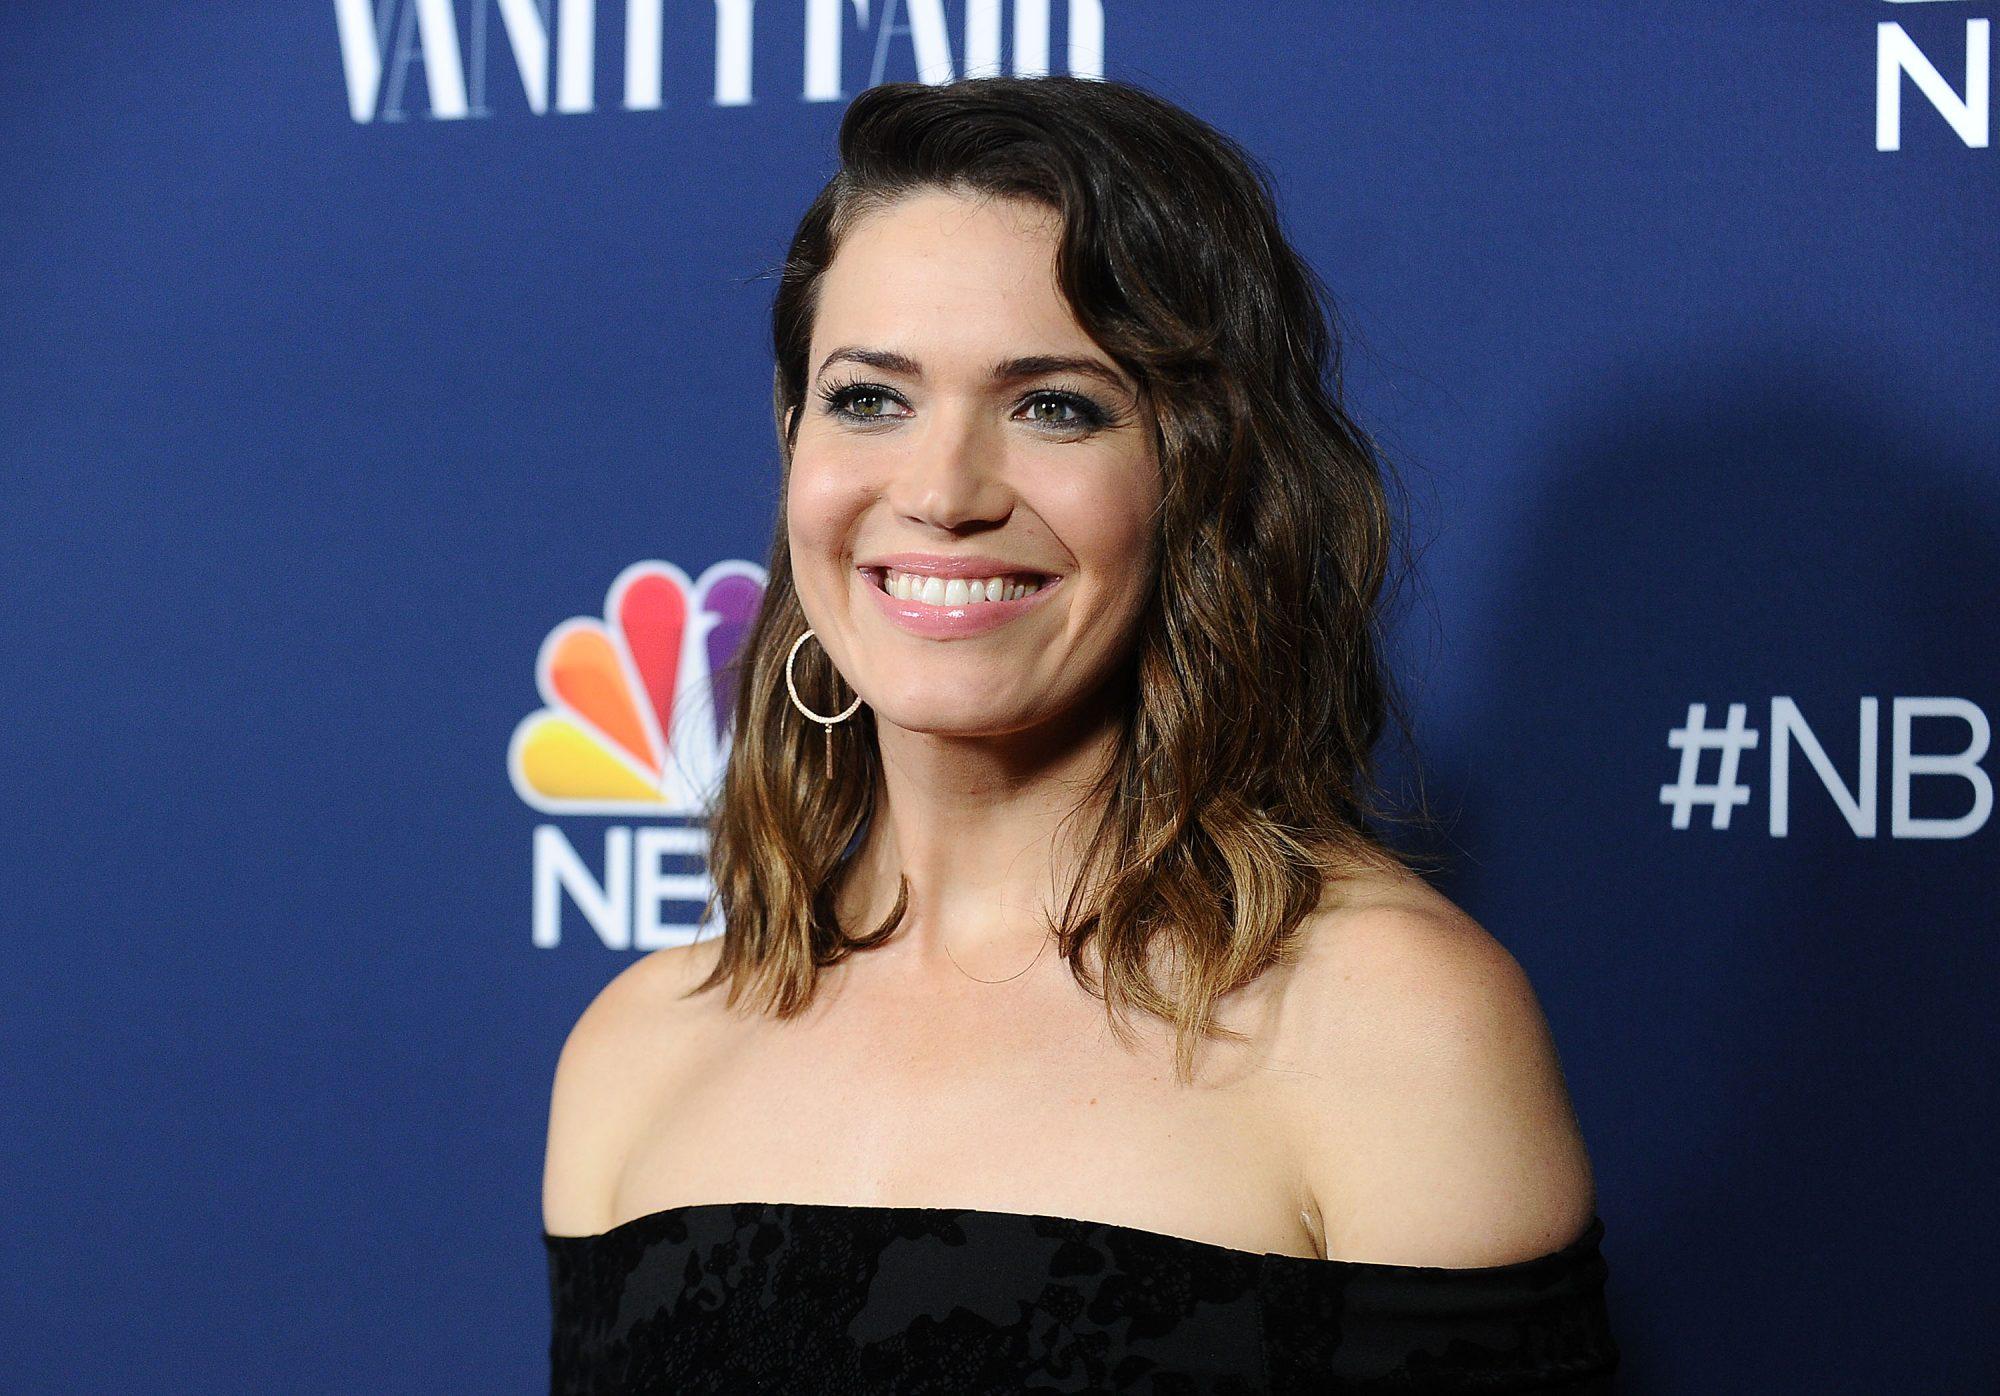 NBC And Vanity Fair Toast the 2016-2017 TV Season - Arrivals